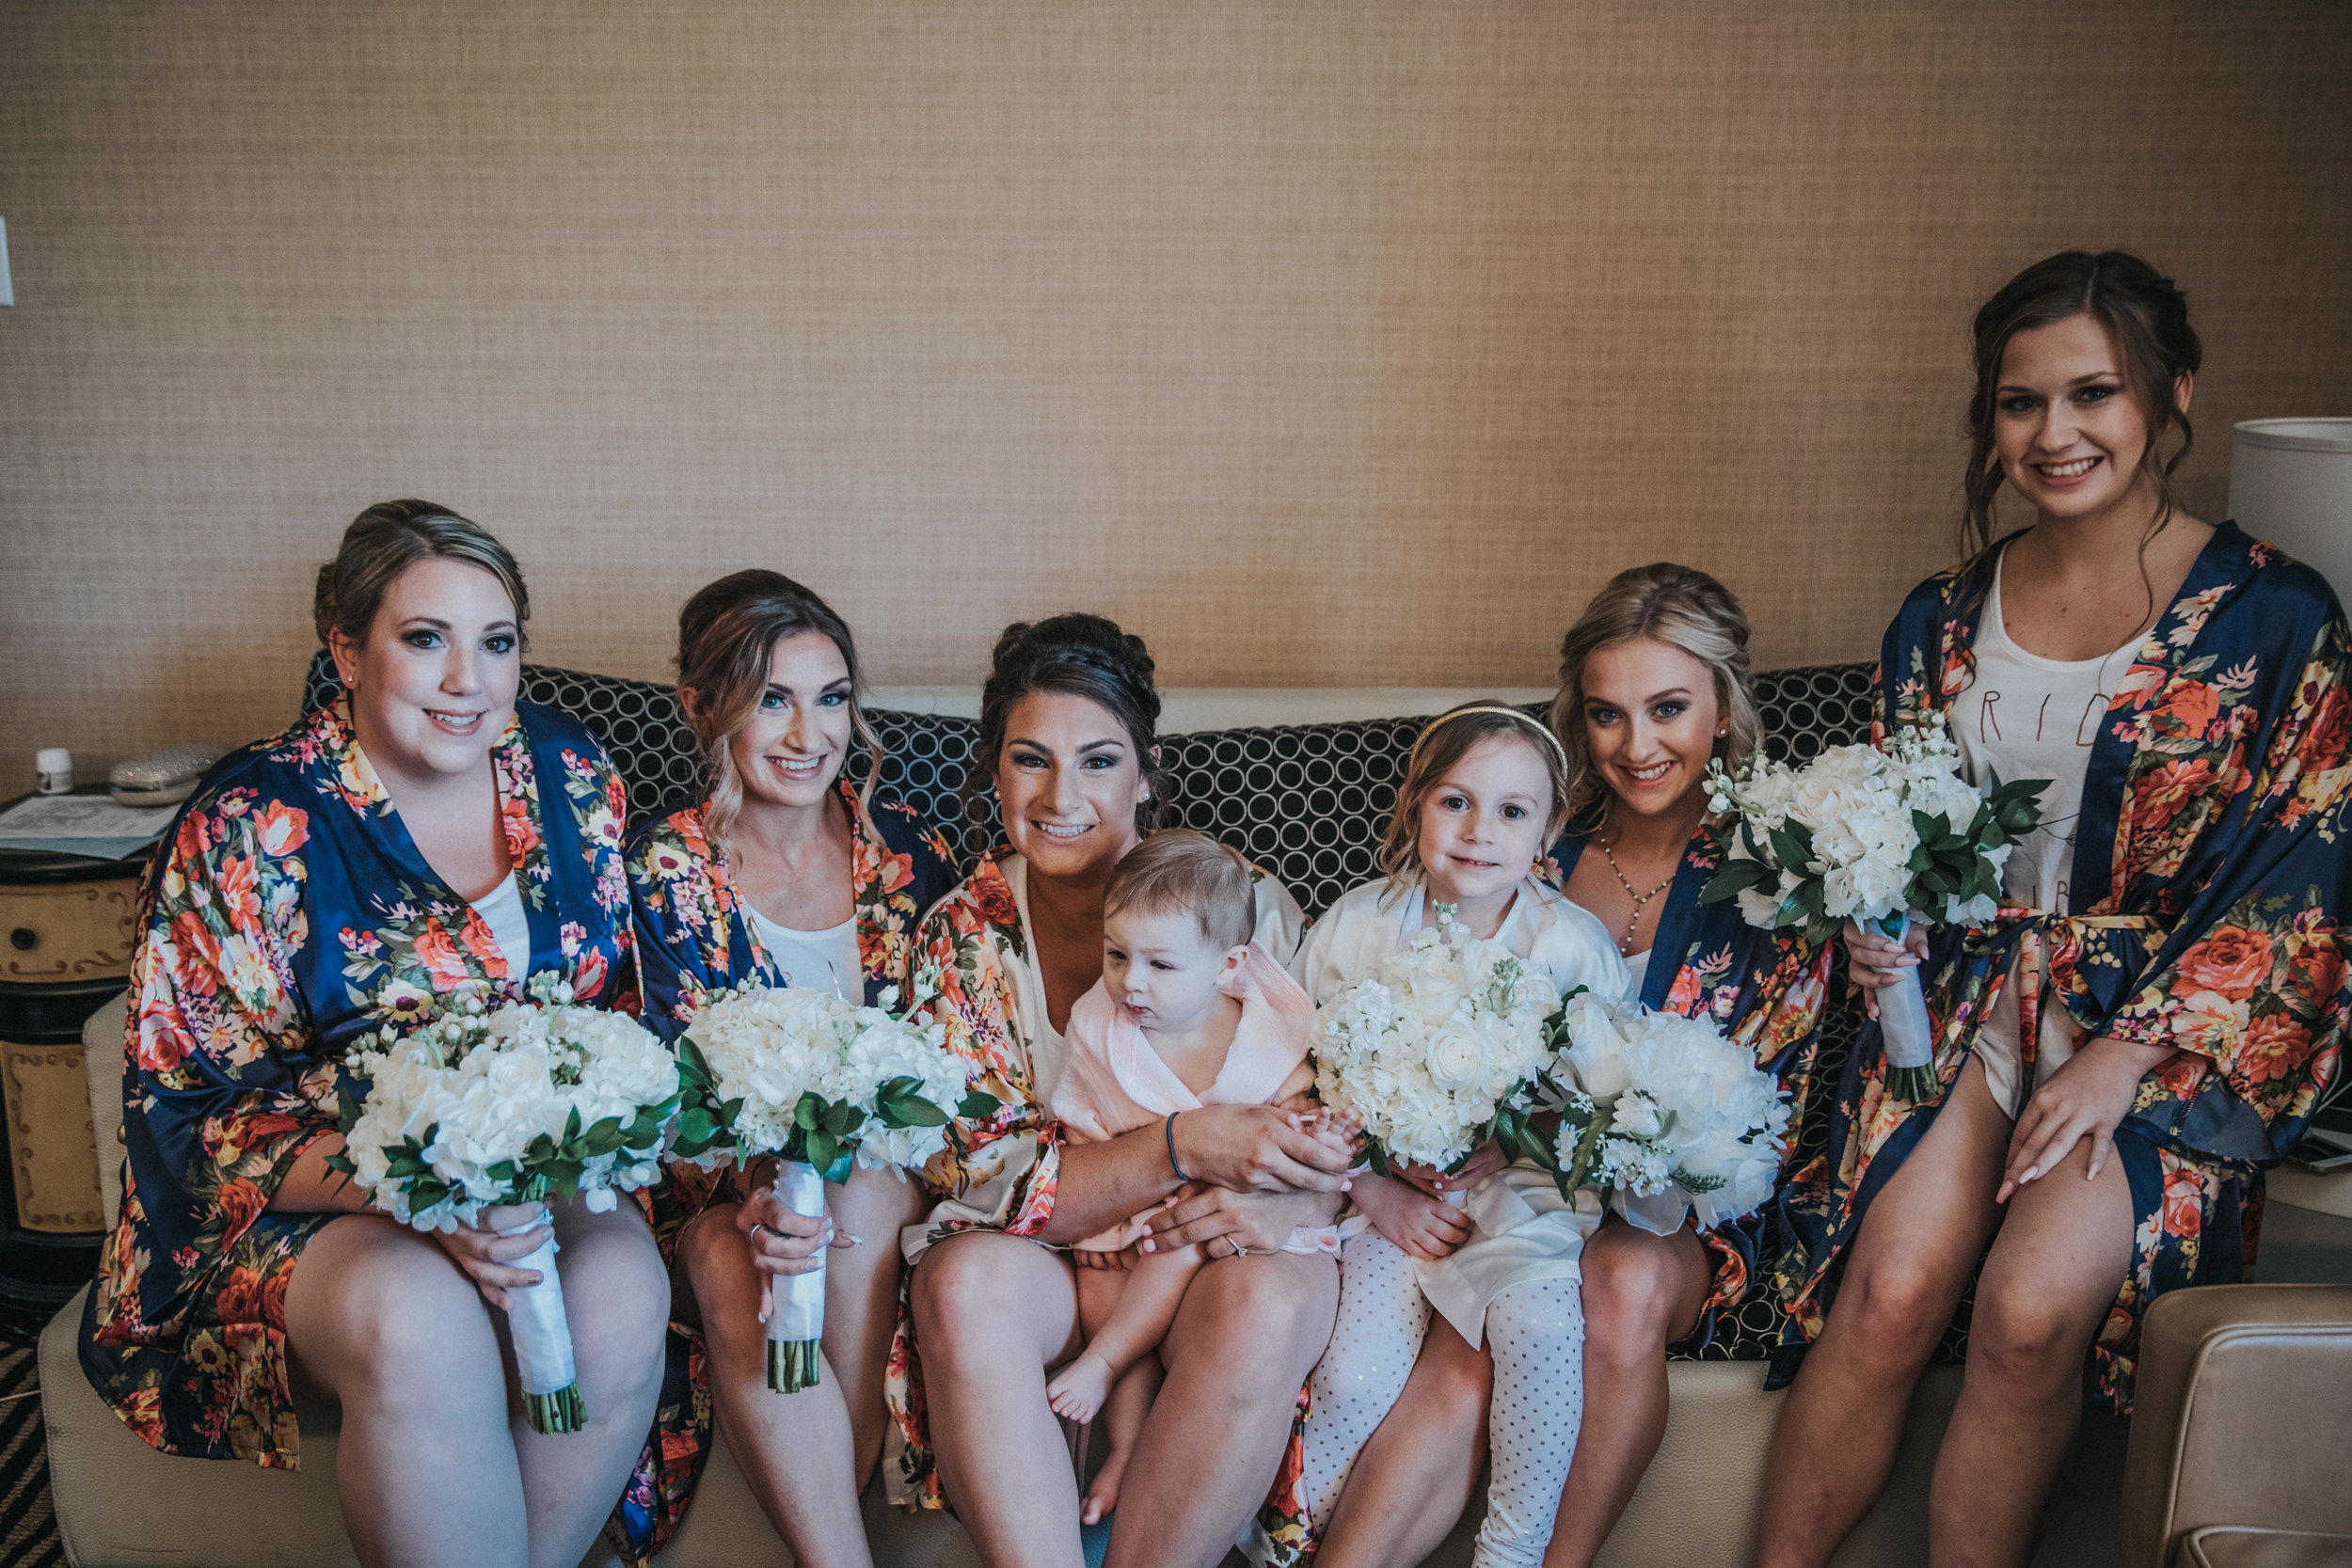 JennaLynnPhotography-NJWeddingPhotographer-Wedding-TheBerkeley-AsburyPark-Allison&Michael-GettingReady-42.jpg